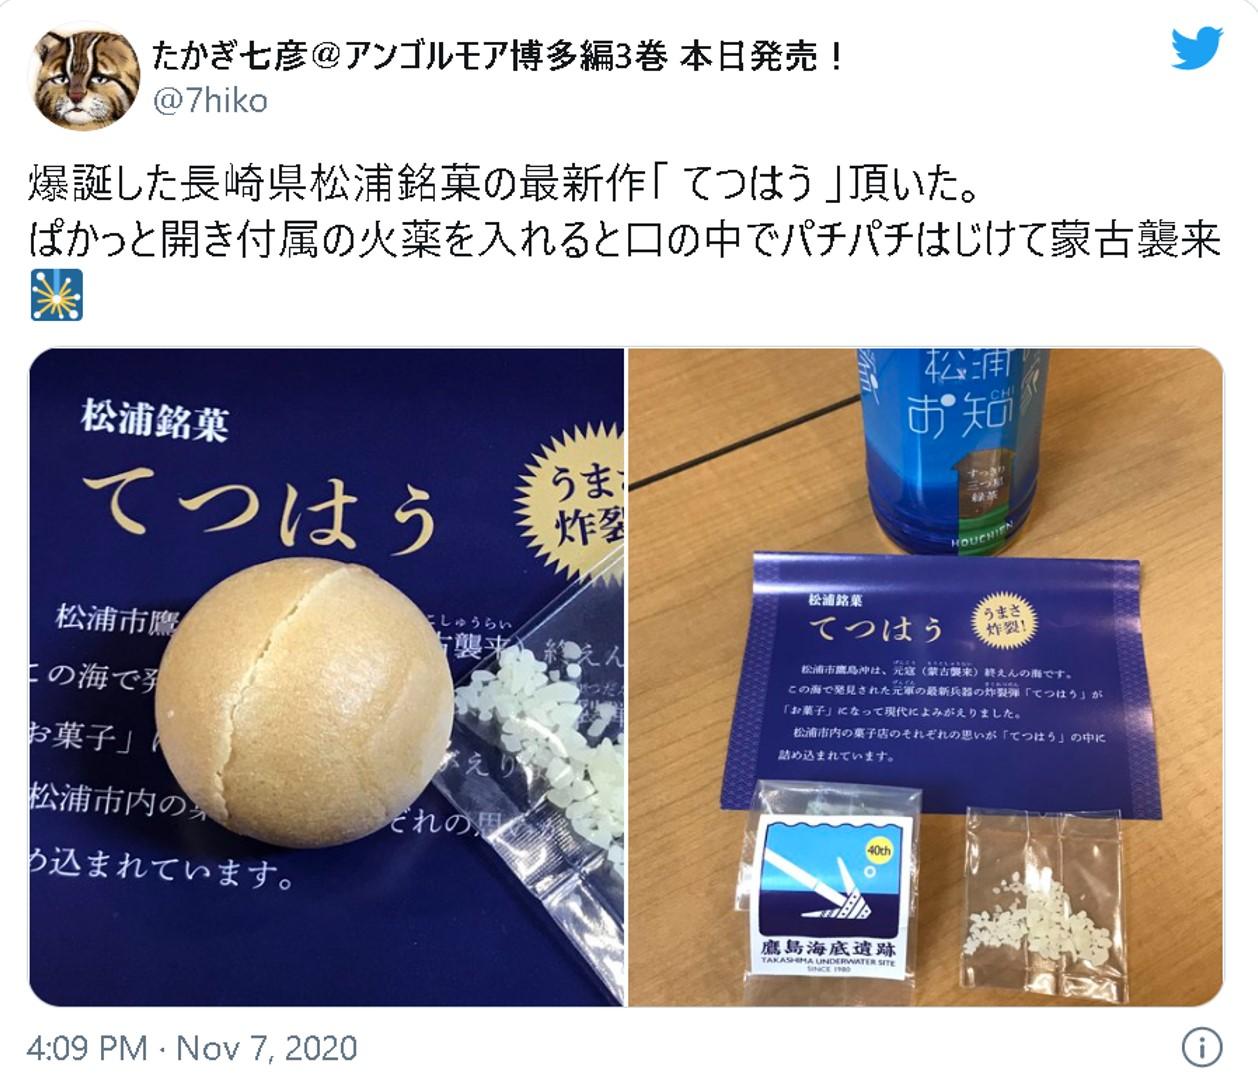 鷹島海底遺跡調査40周年!